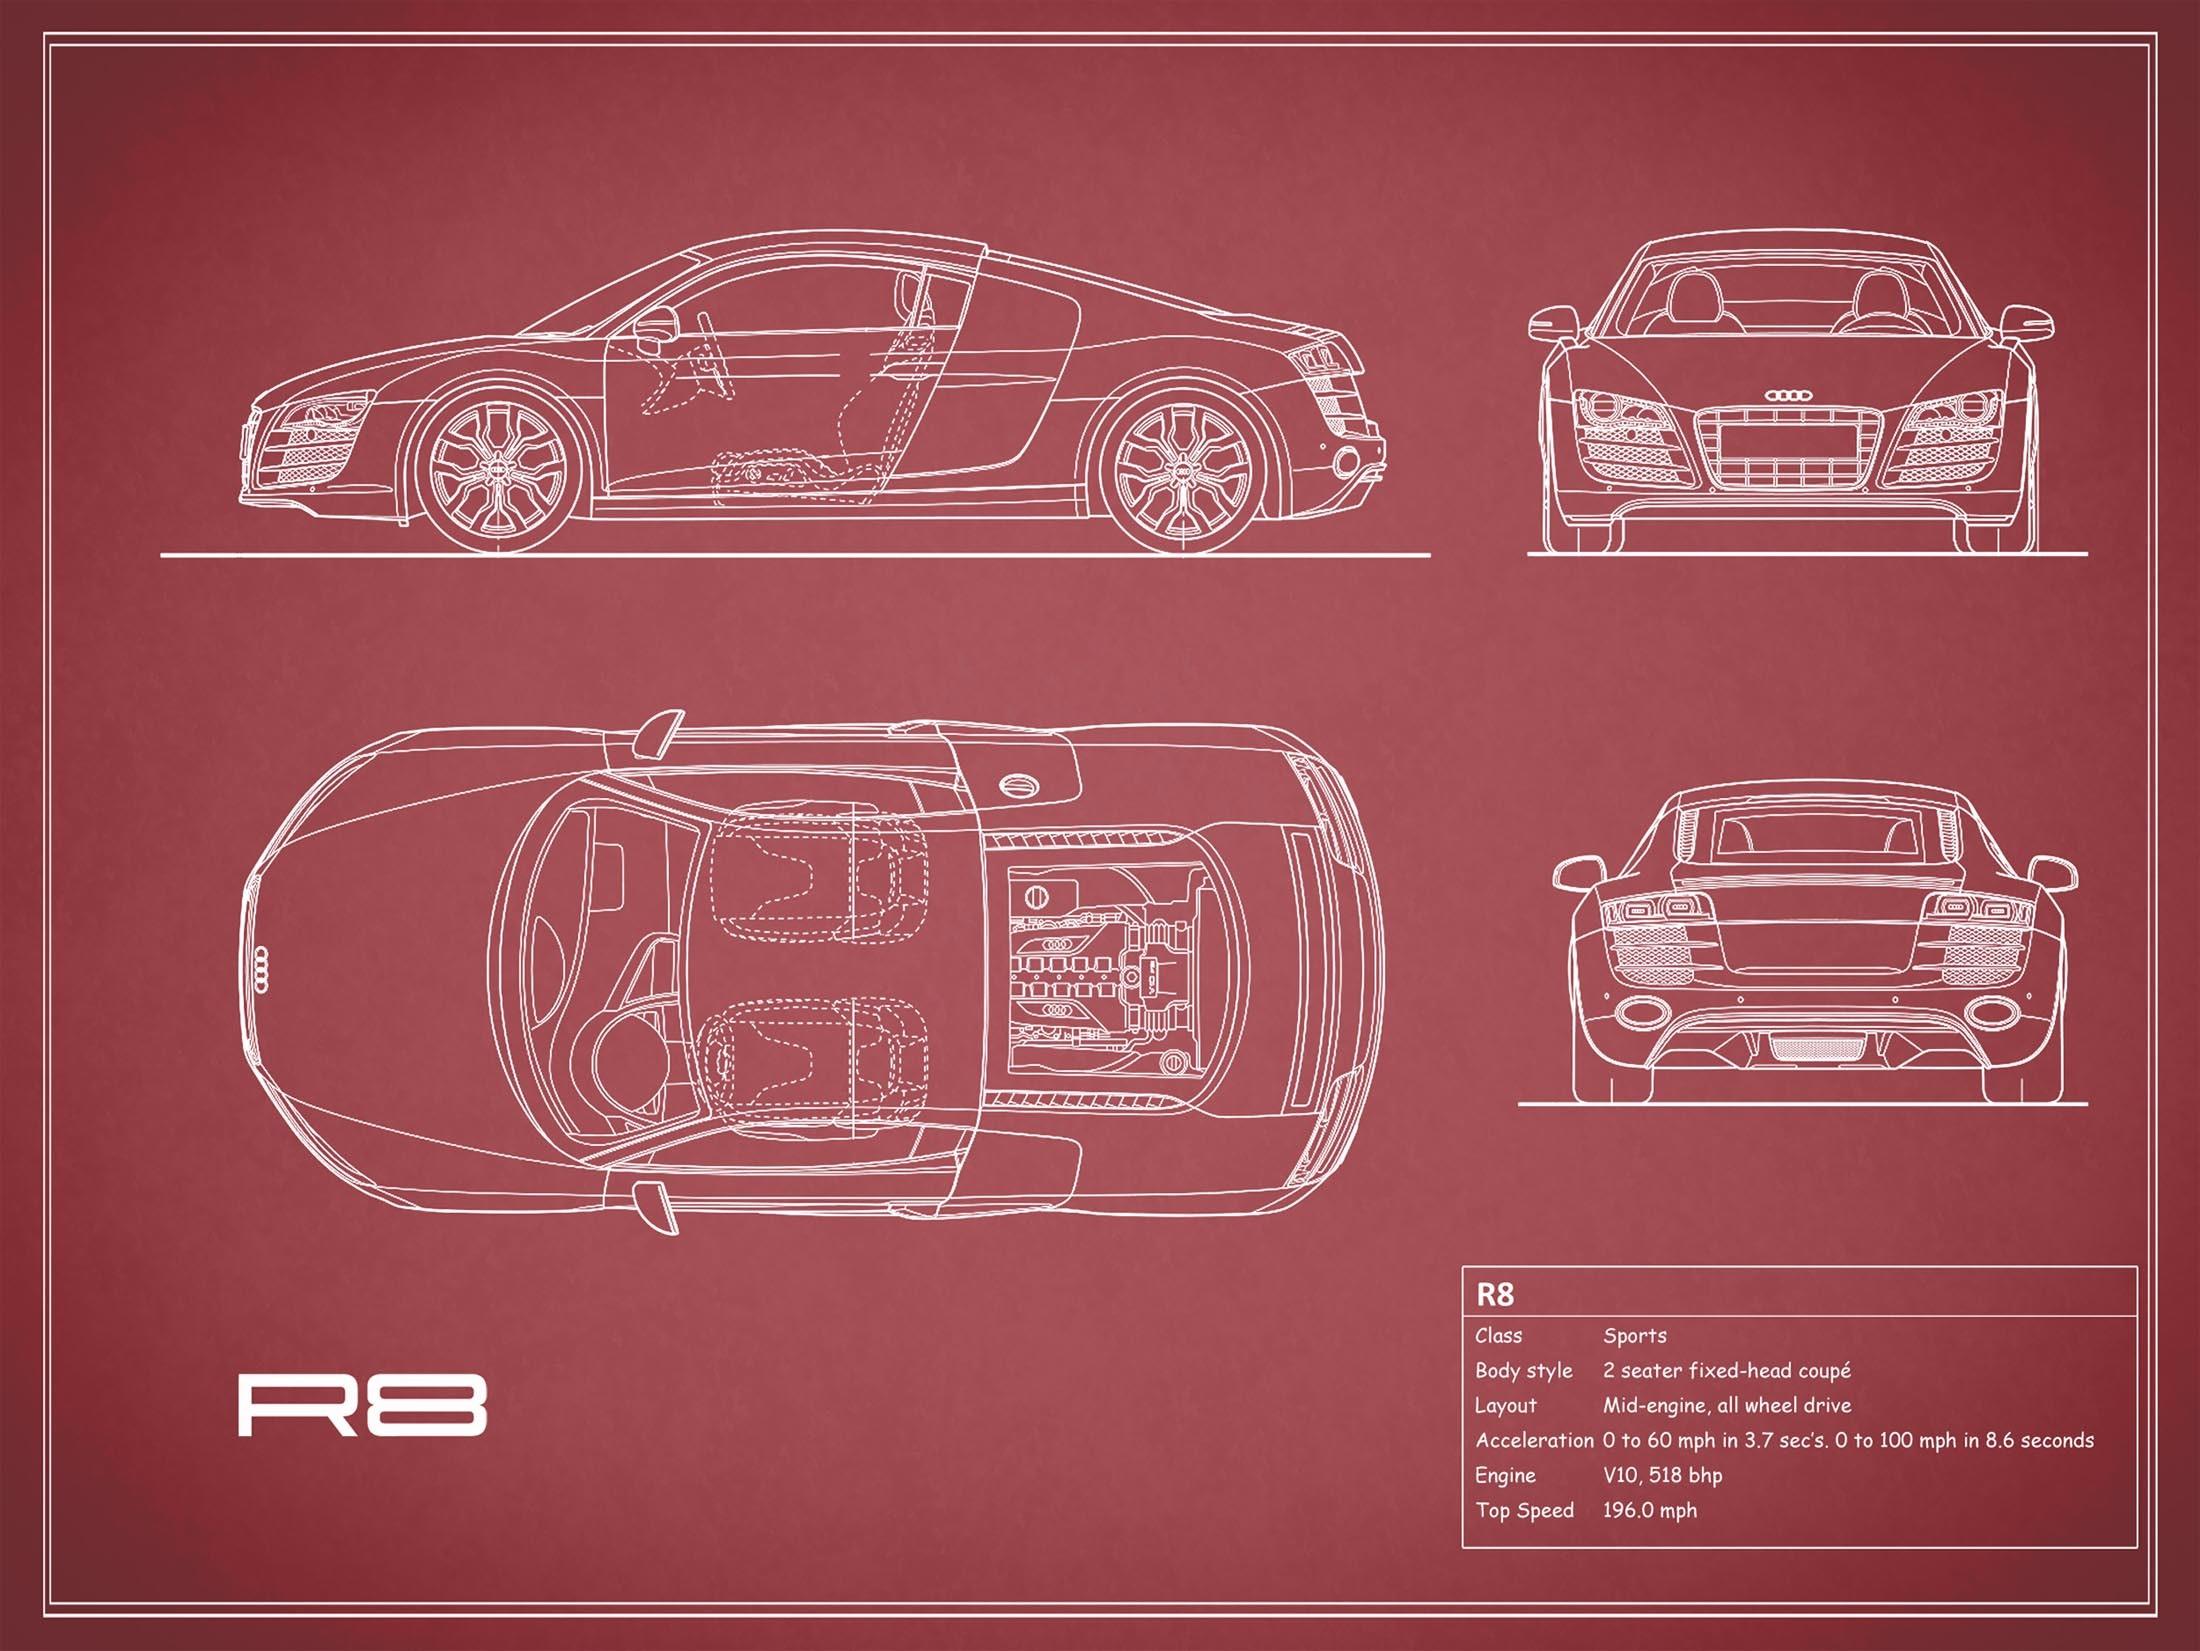 Audi R8 - Red